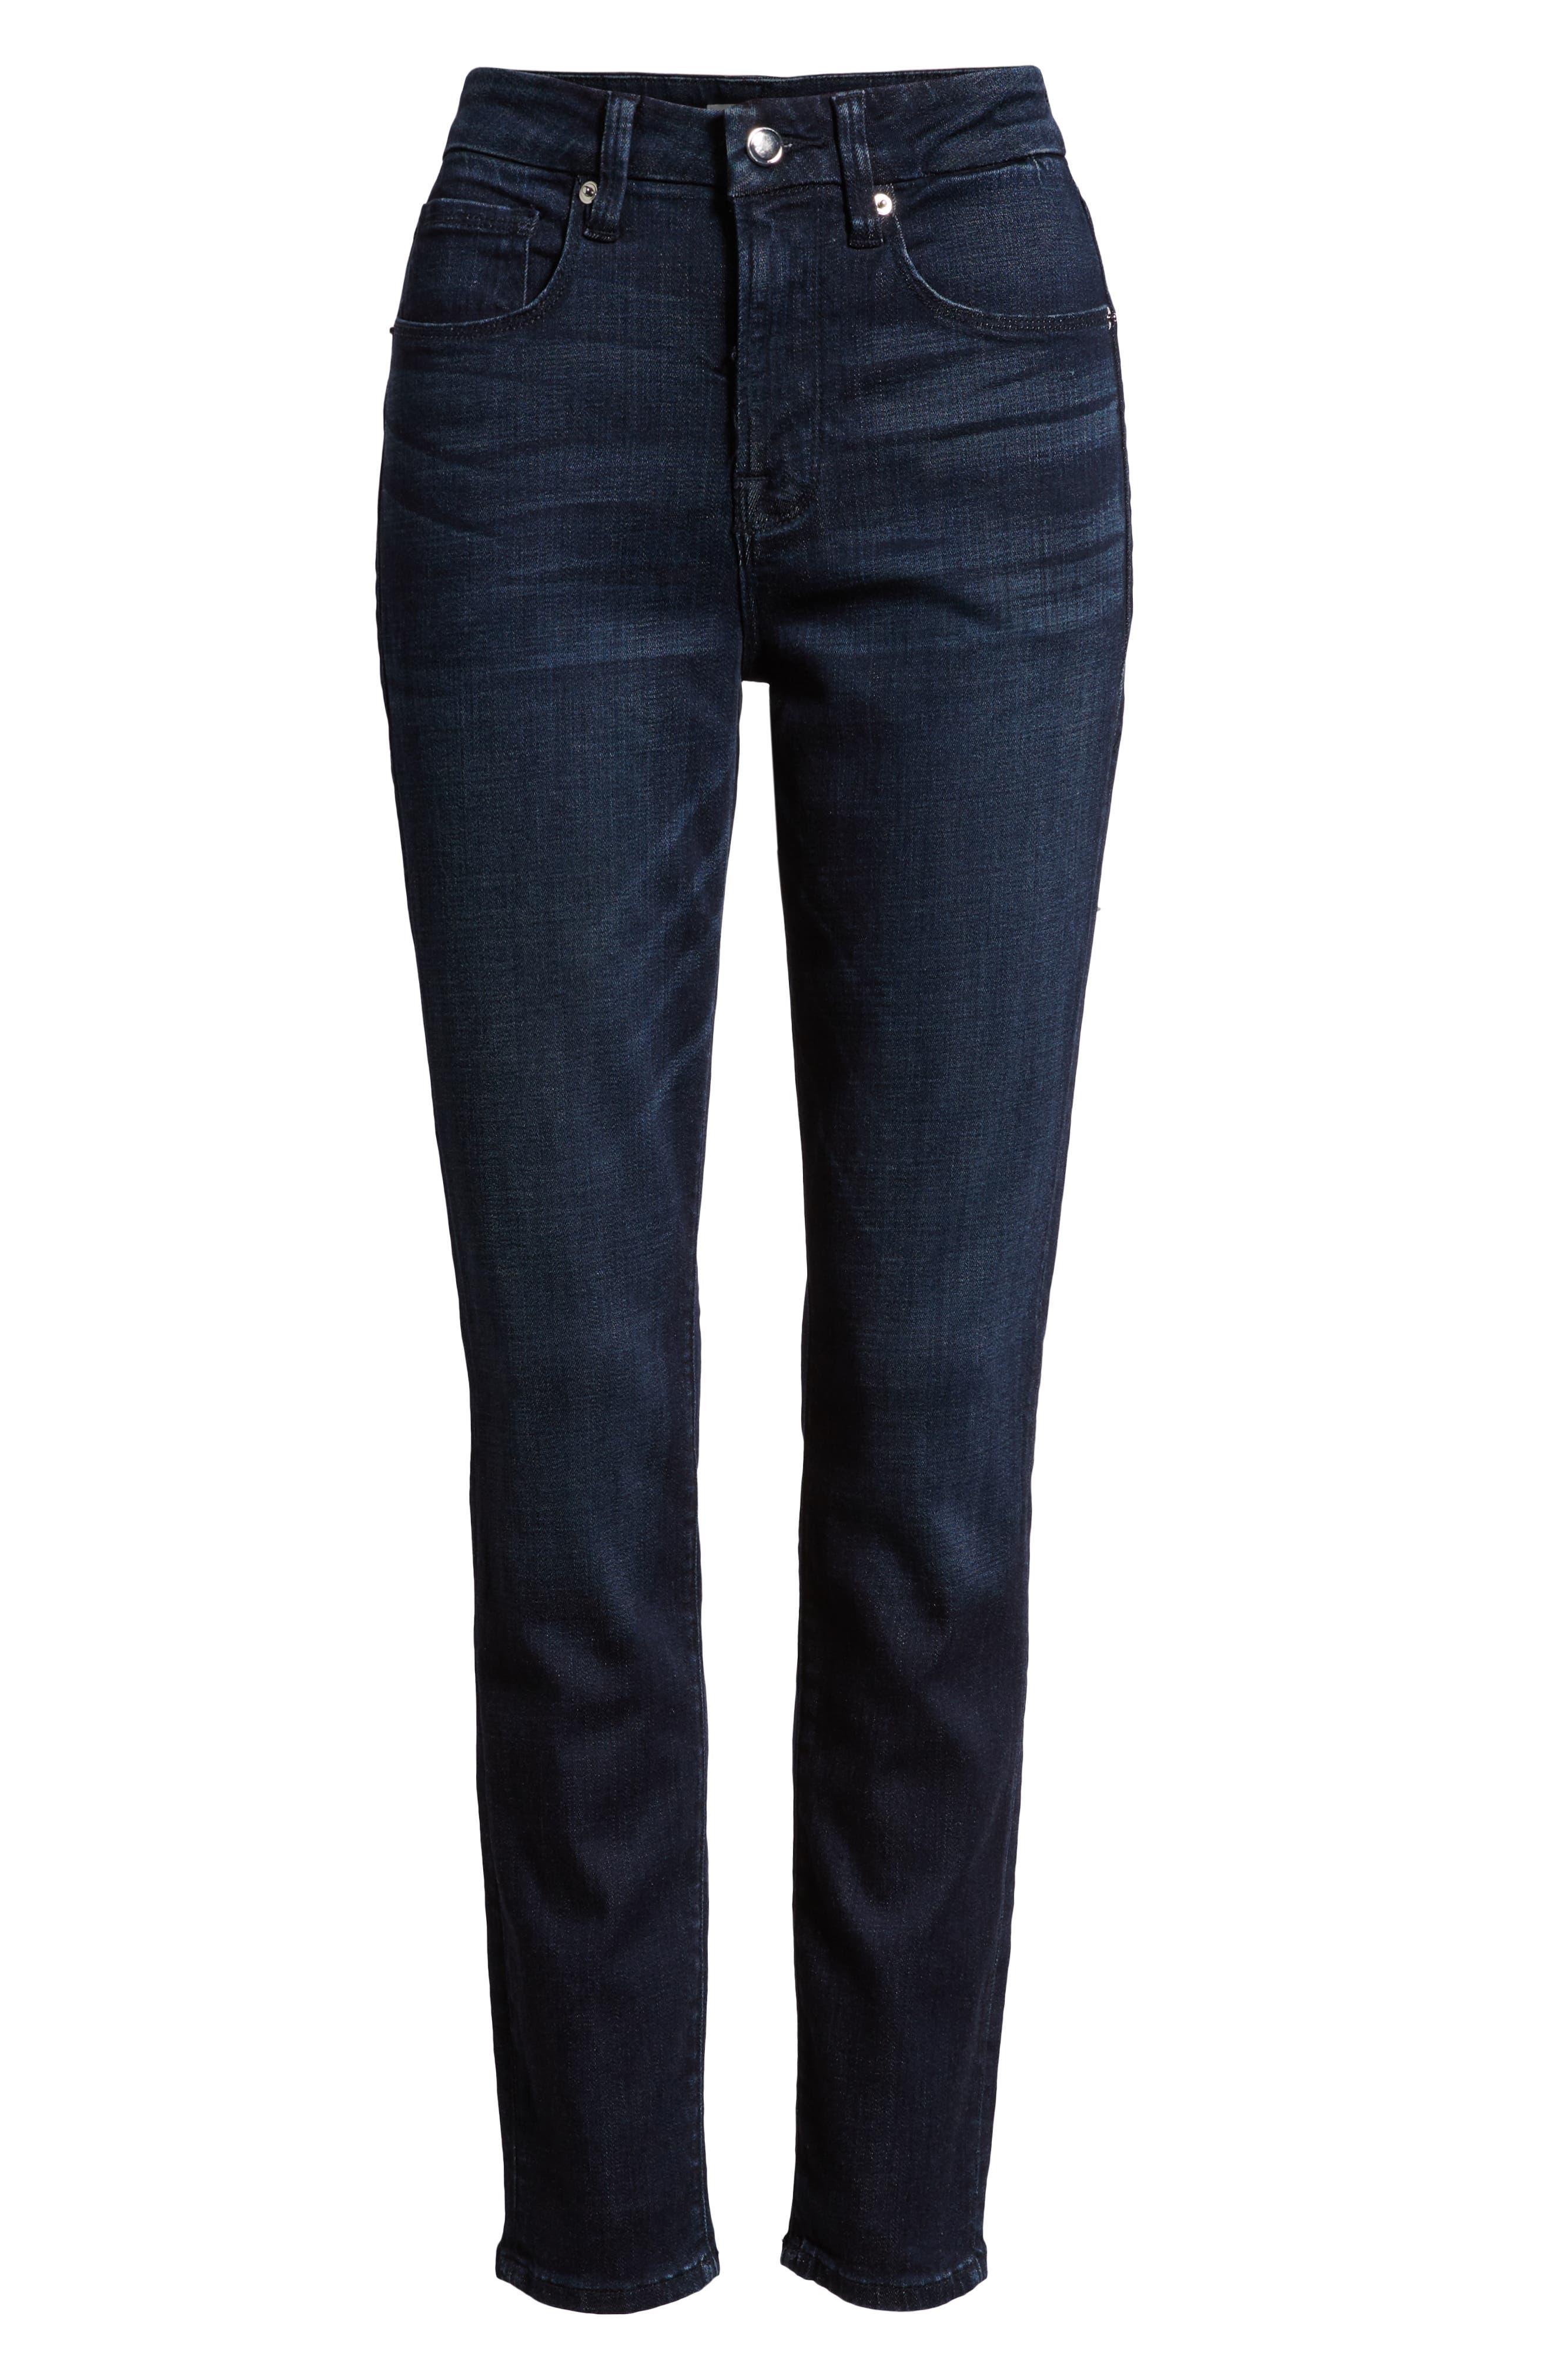 GOOD AMERICAN,                             Good Legs High Waist Skinny Jeans,                             Alternate thumbnail 4, color,                             401